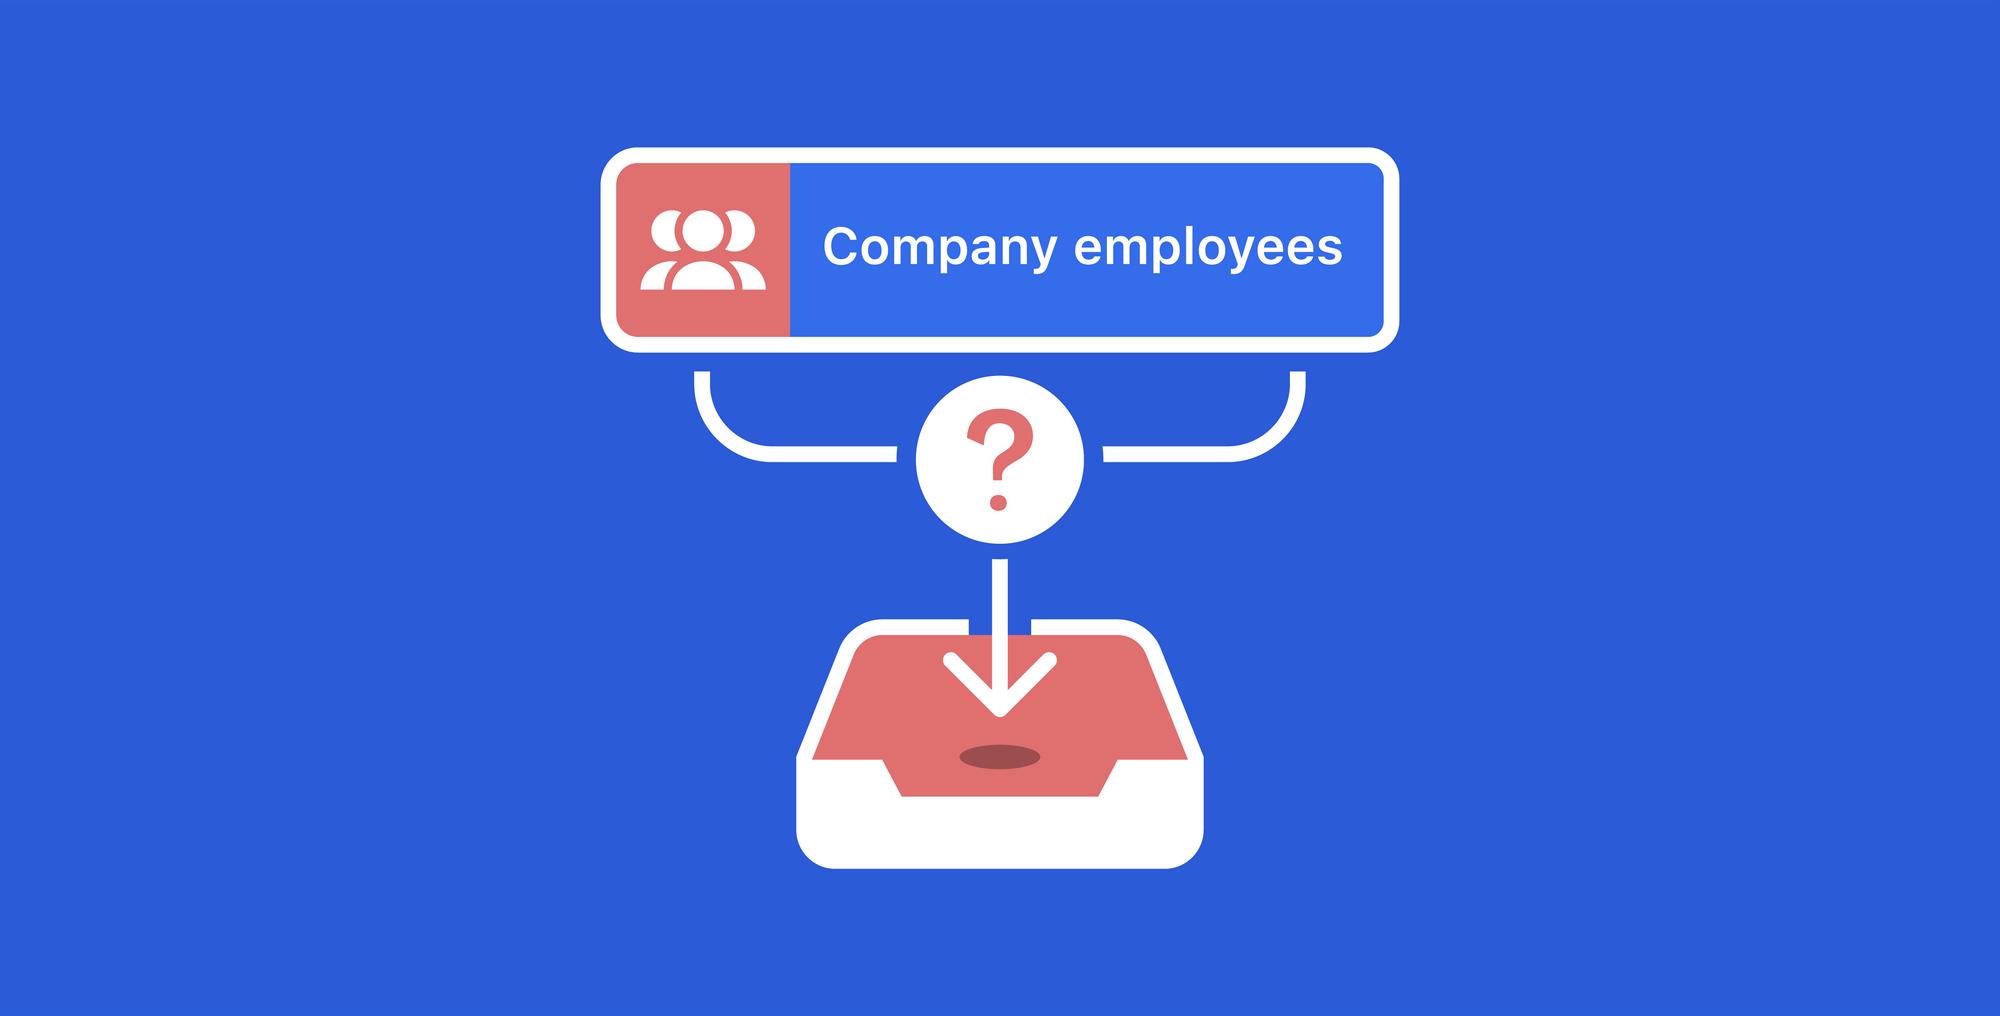 How can I retrieve a list of all employees within a company through the LinkedIn API?